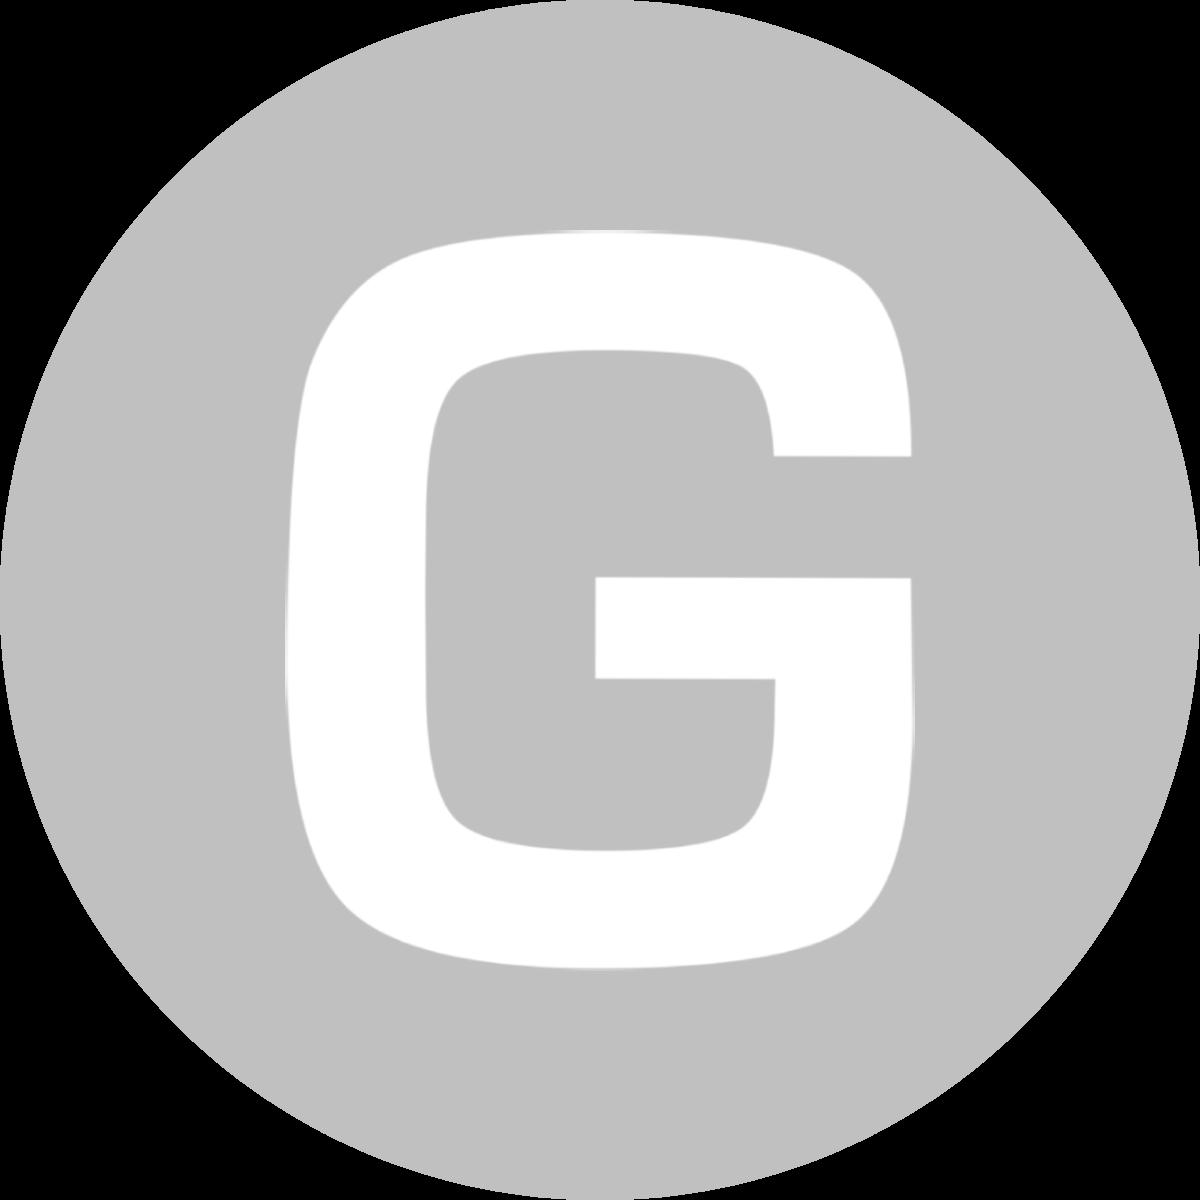 Golf Gear pegger 20 stk 35mm